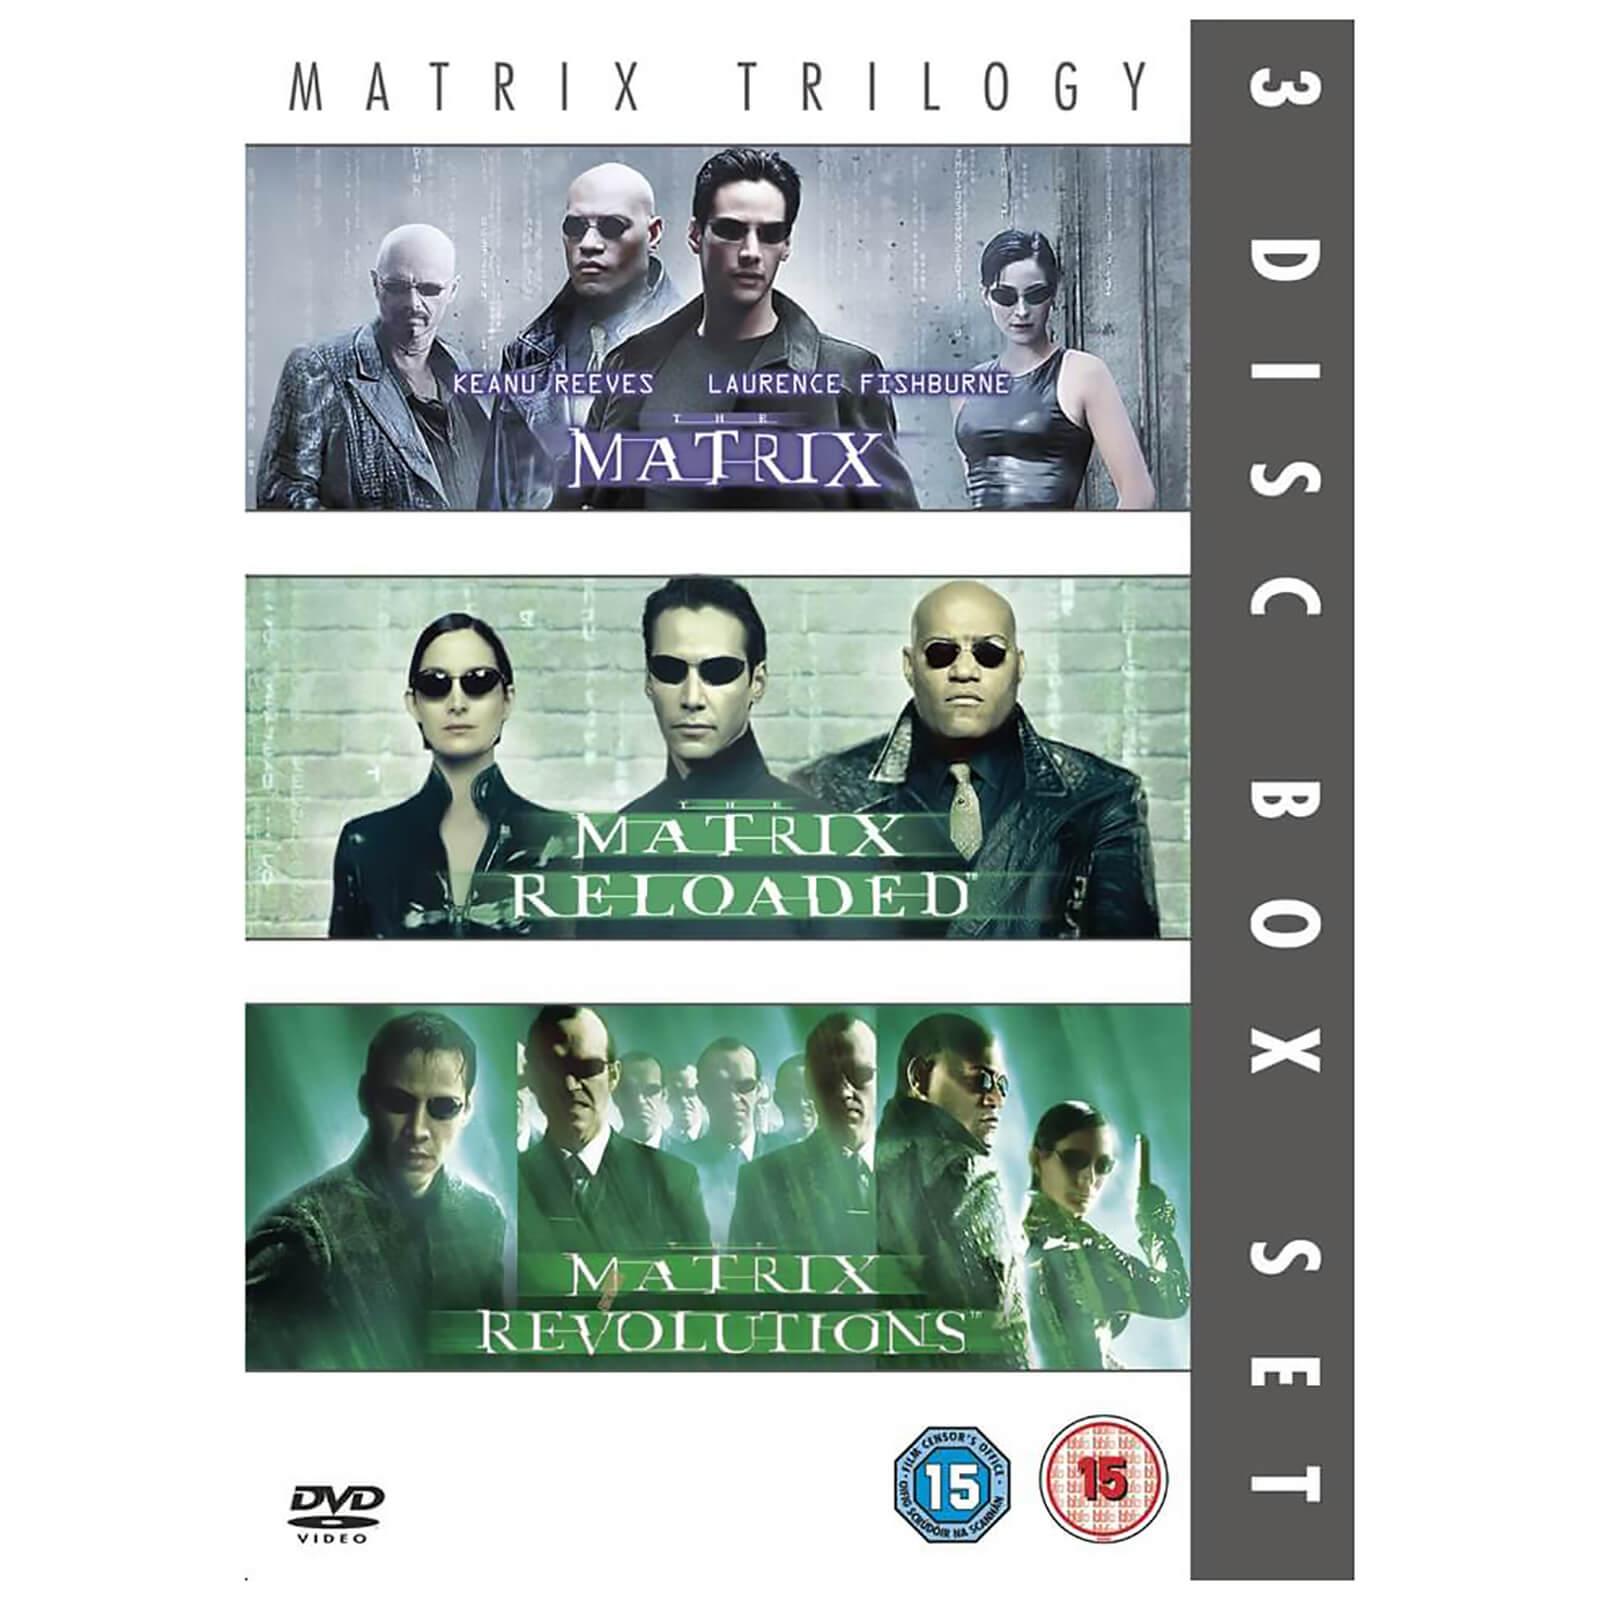 The Matrix/Matrix Reloaded/Matrix Revolution